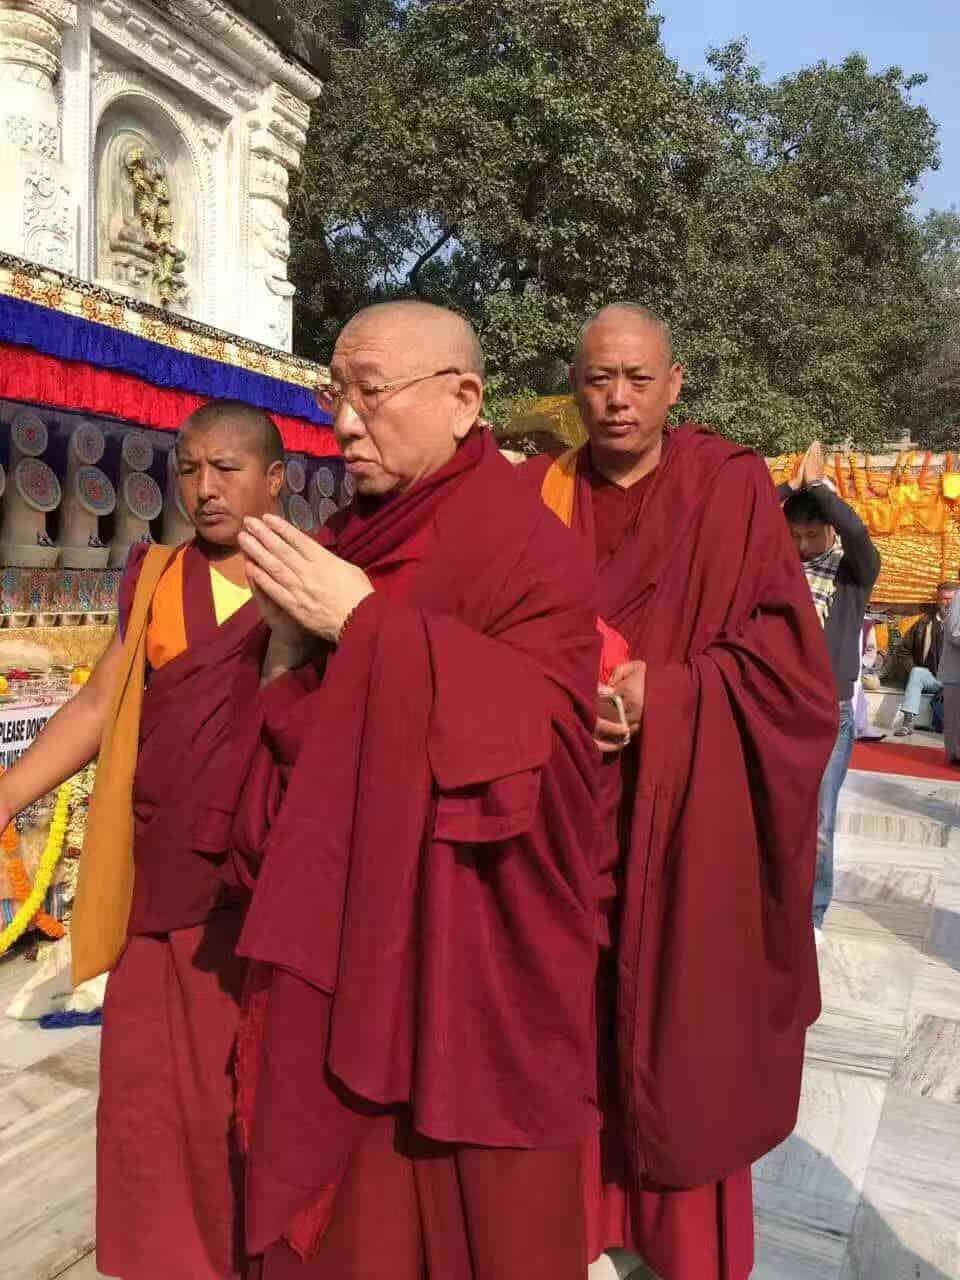 Gosok Rinpoche India 2017 1a80c9ef6d89b95d11882b2877f259a